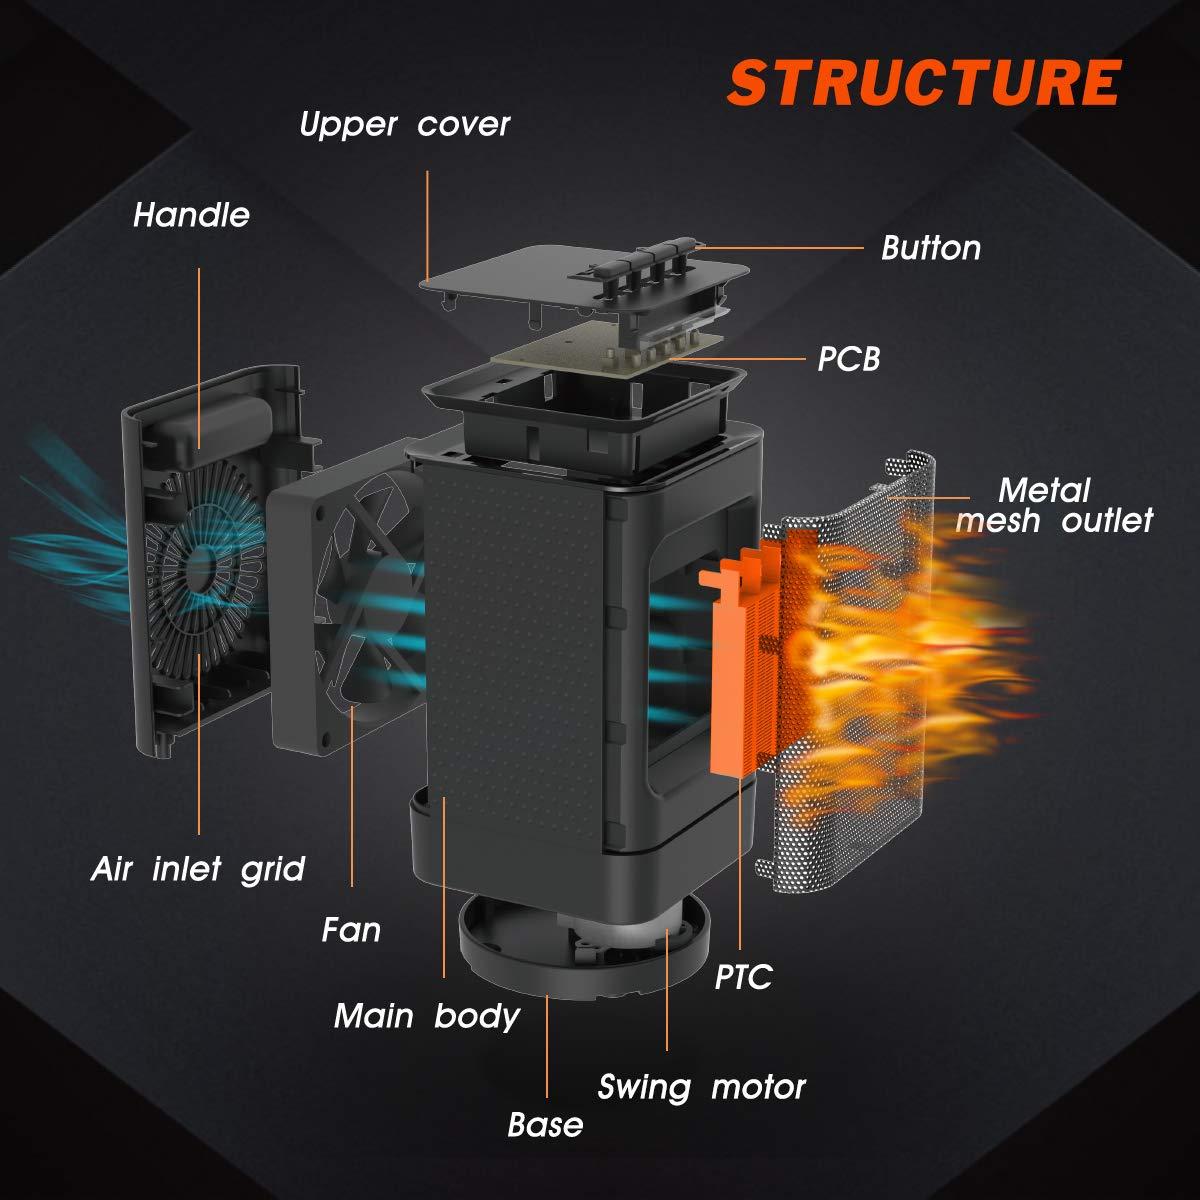 NASUM Calentador de Ventilador Calefacci/ón de 3 Modos 2s Ahorro de Energ/ía Adecuado para Dormitorio Calefacci/ón Ecol/ógica Oficina Calentador Peque/ño de 950 W Ba/ño